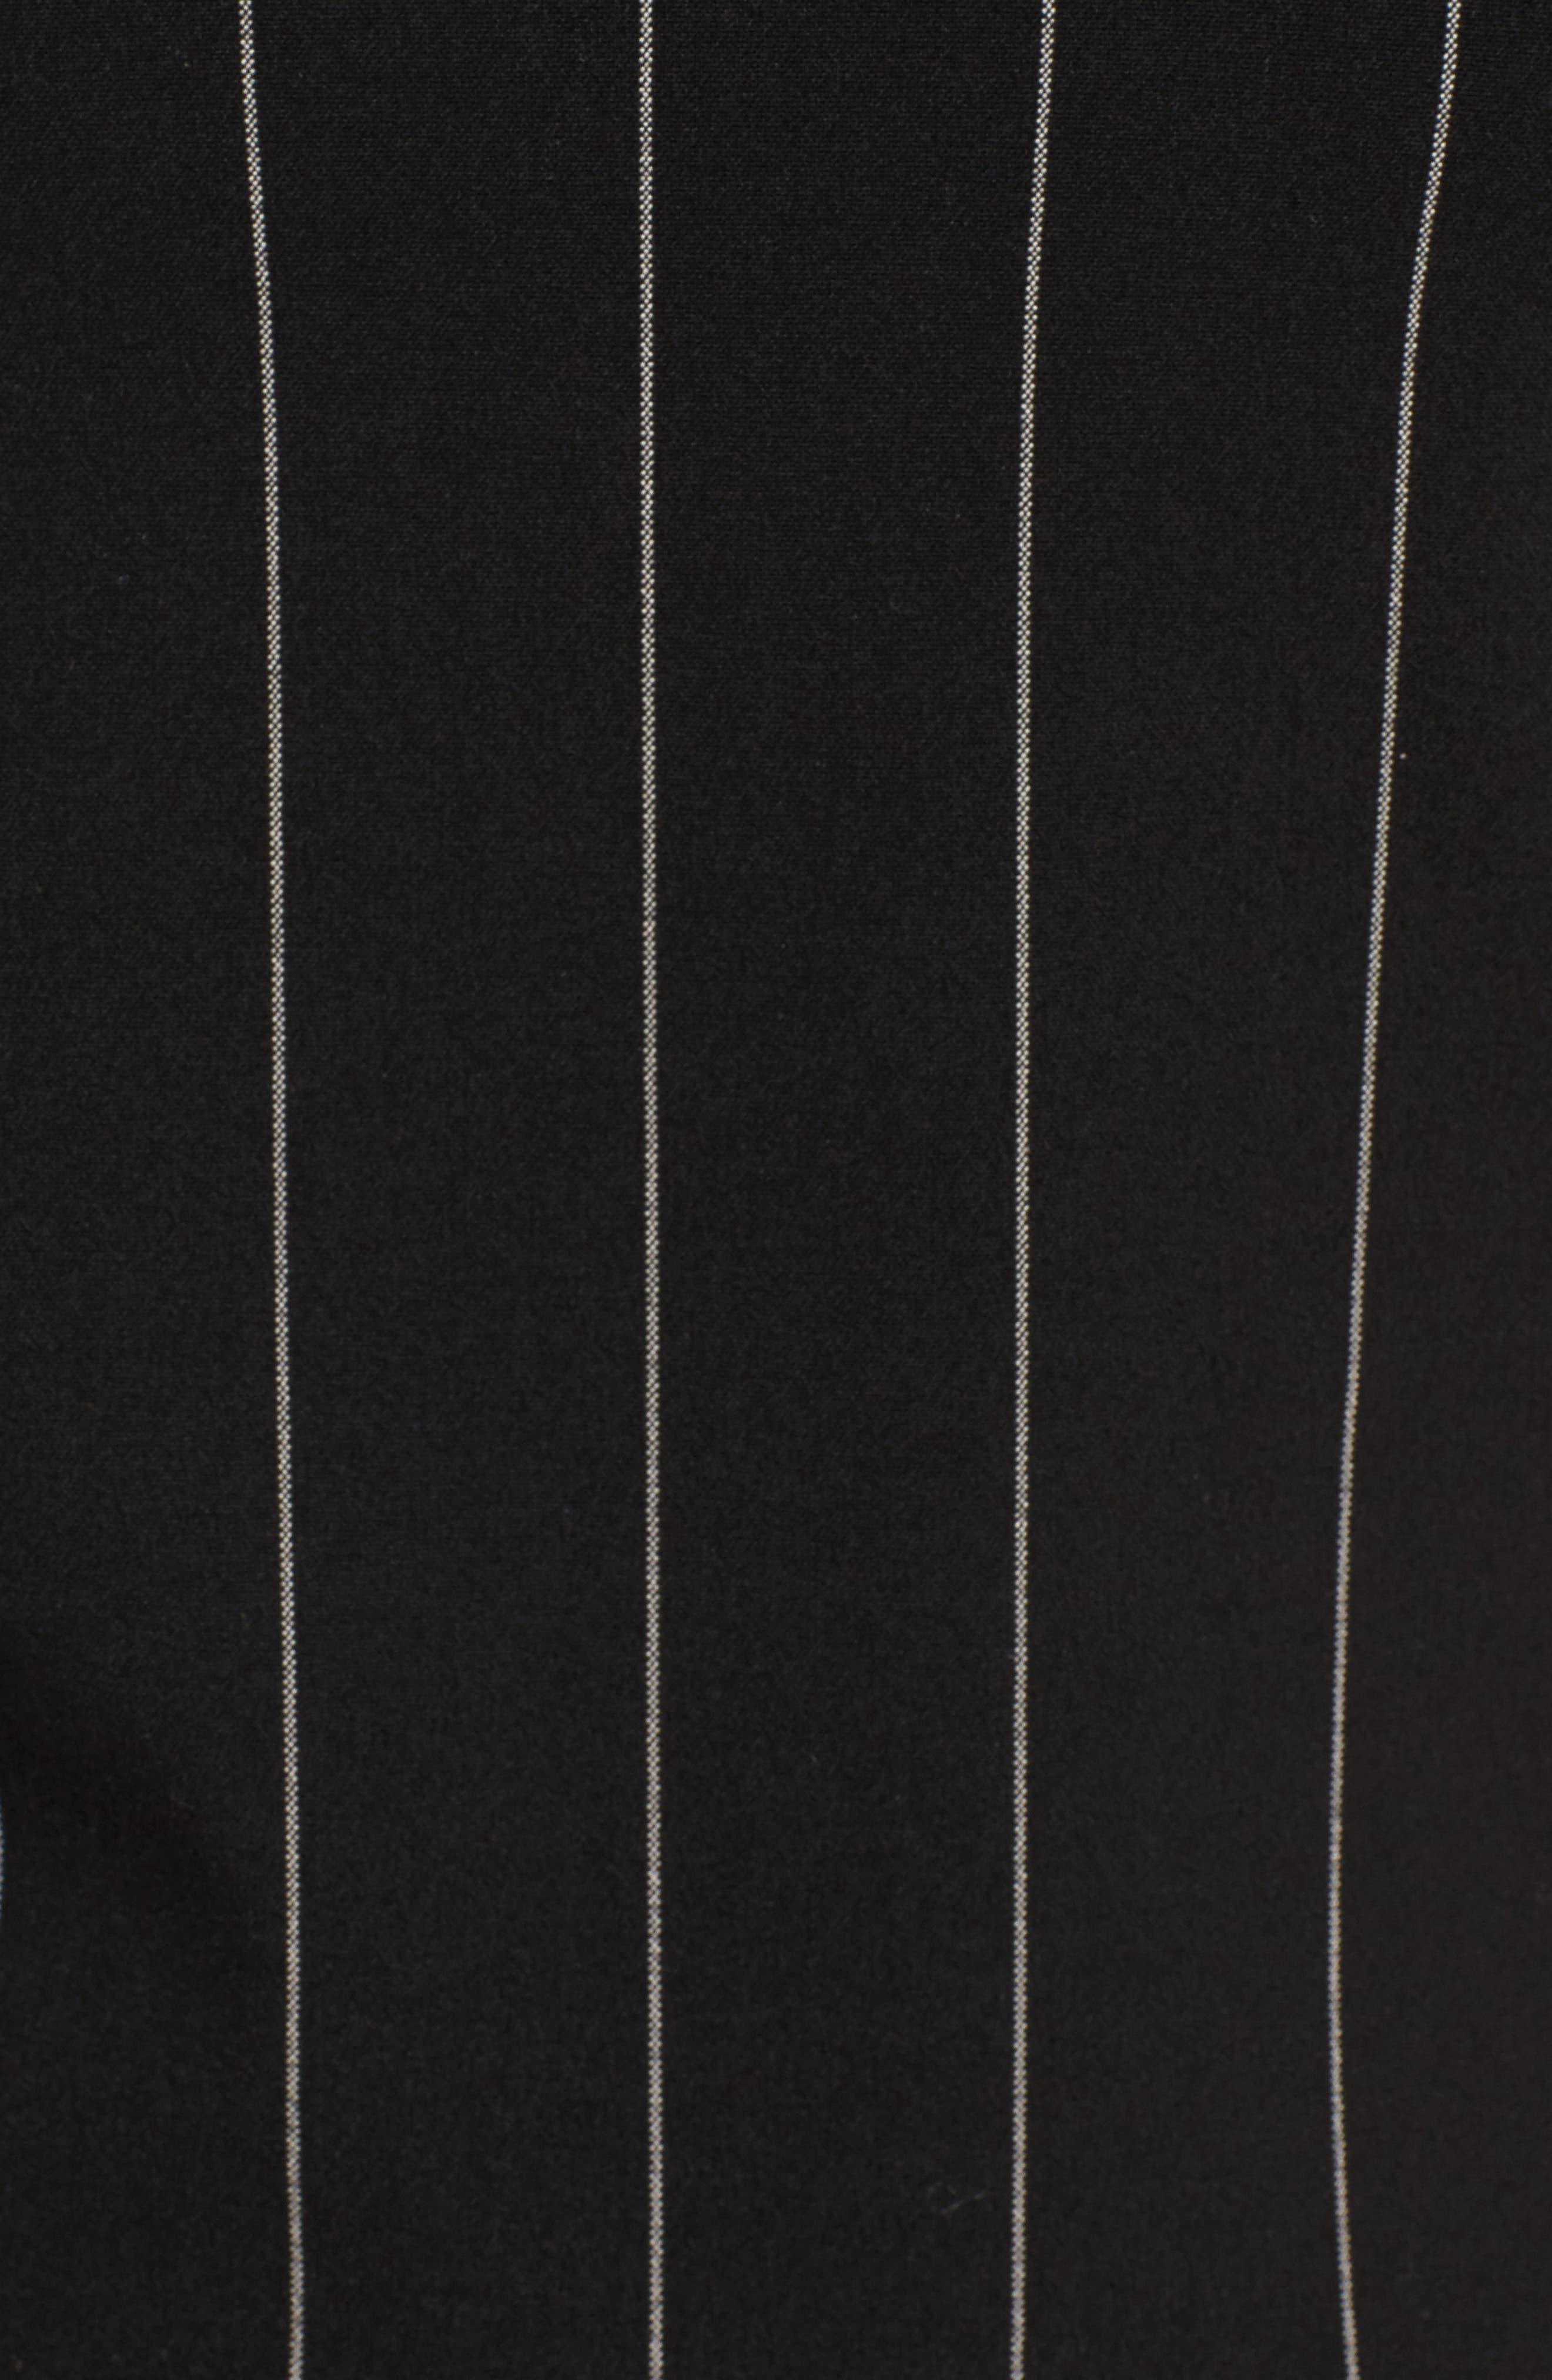 Pinstripe Blouse,                             Alternate thumbnail 5, color,                             Black/ White